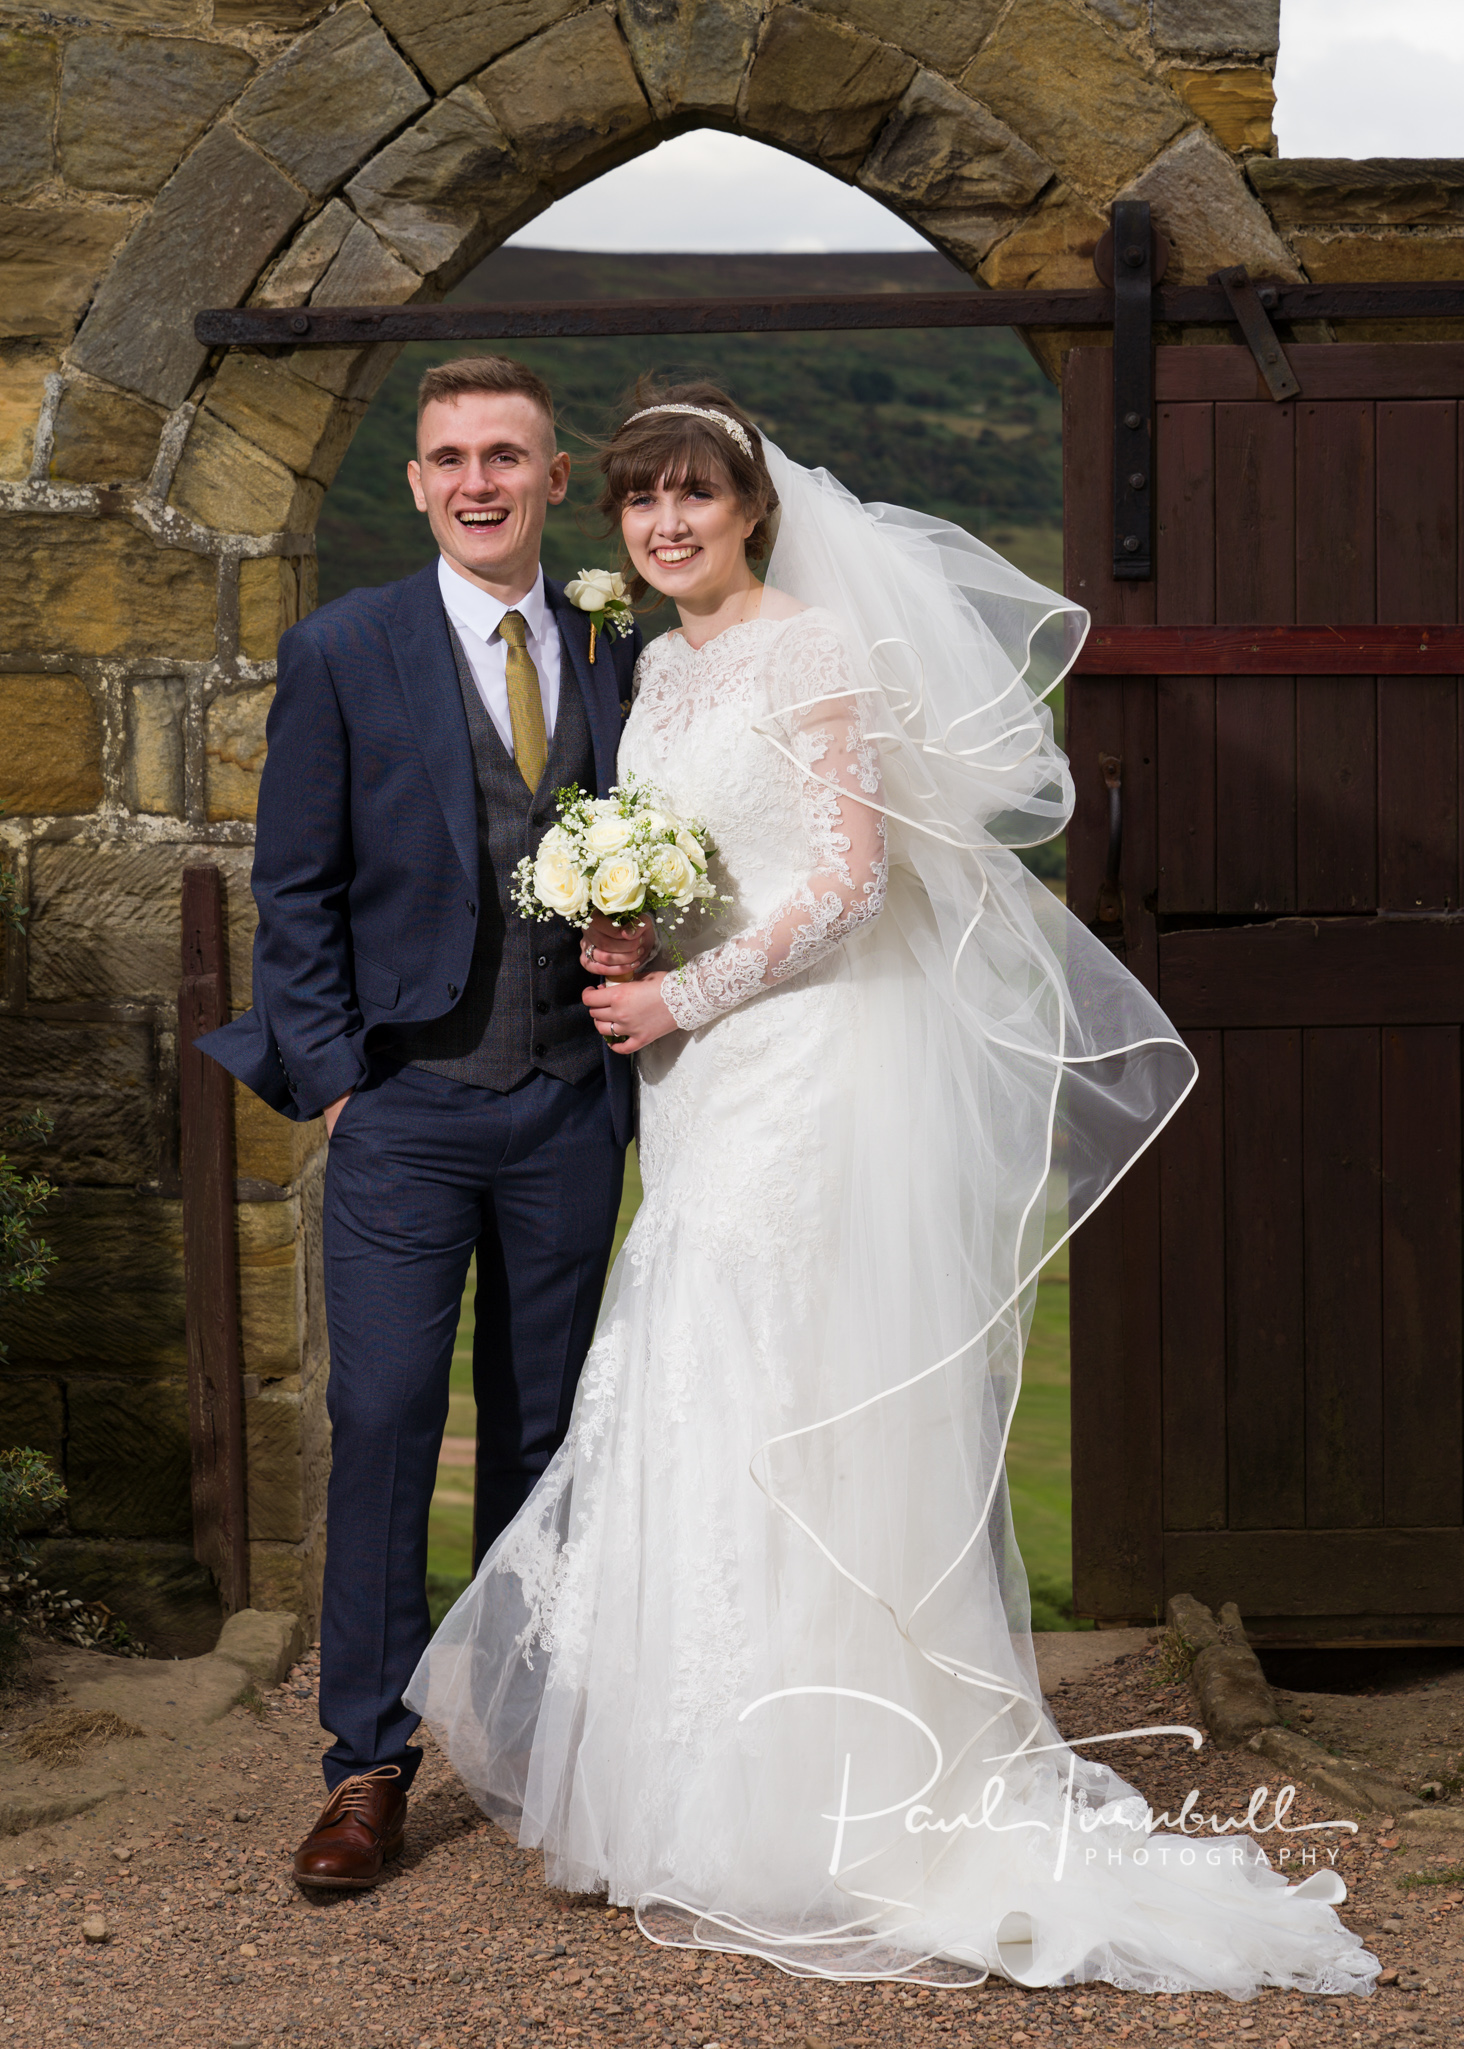 wedding-photographer-raven-hall-ravenscroft--scarborough-yorkshire-lucy-ryan-072.jpg